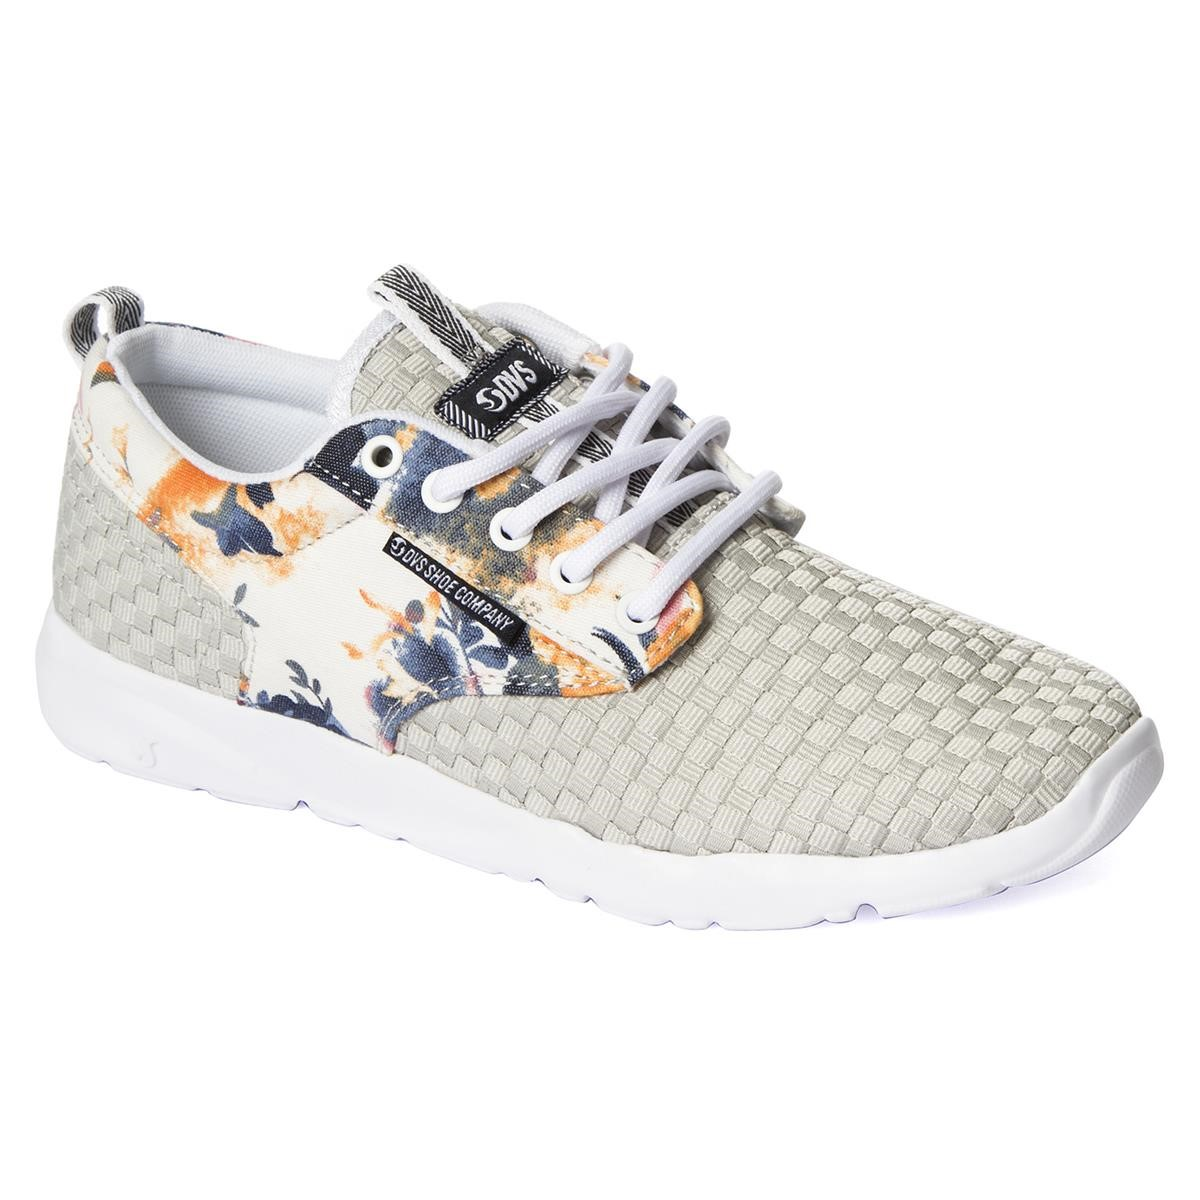 DVS Girls Schuhe Premier 2.0 Tan/Blau